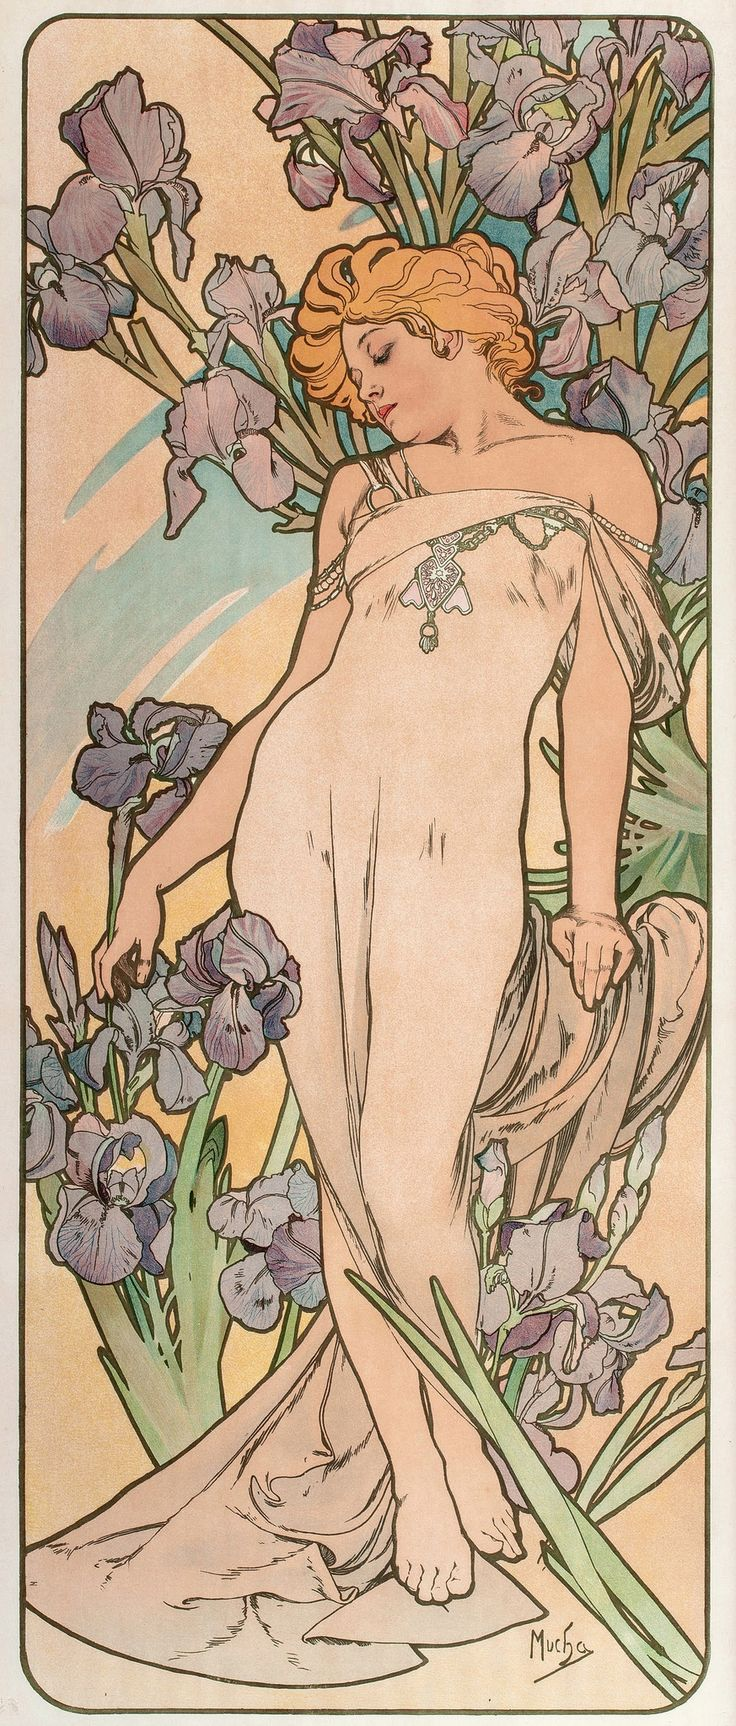 Les Fleurs: The Iris, by Alphonse Mucha, 1898